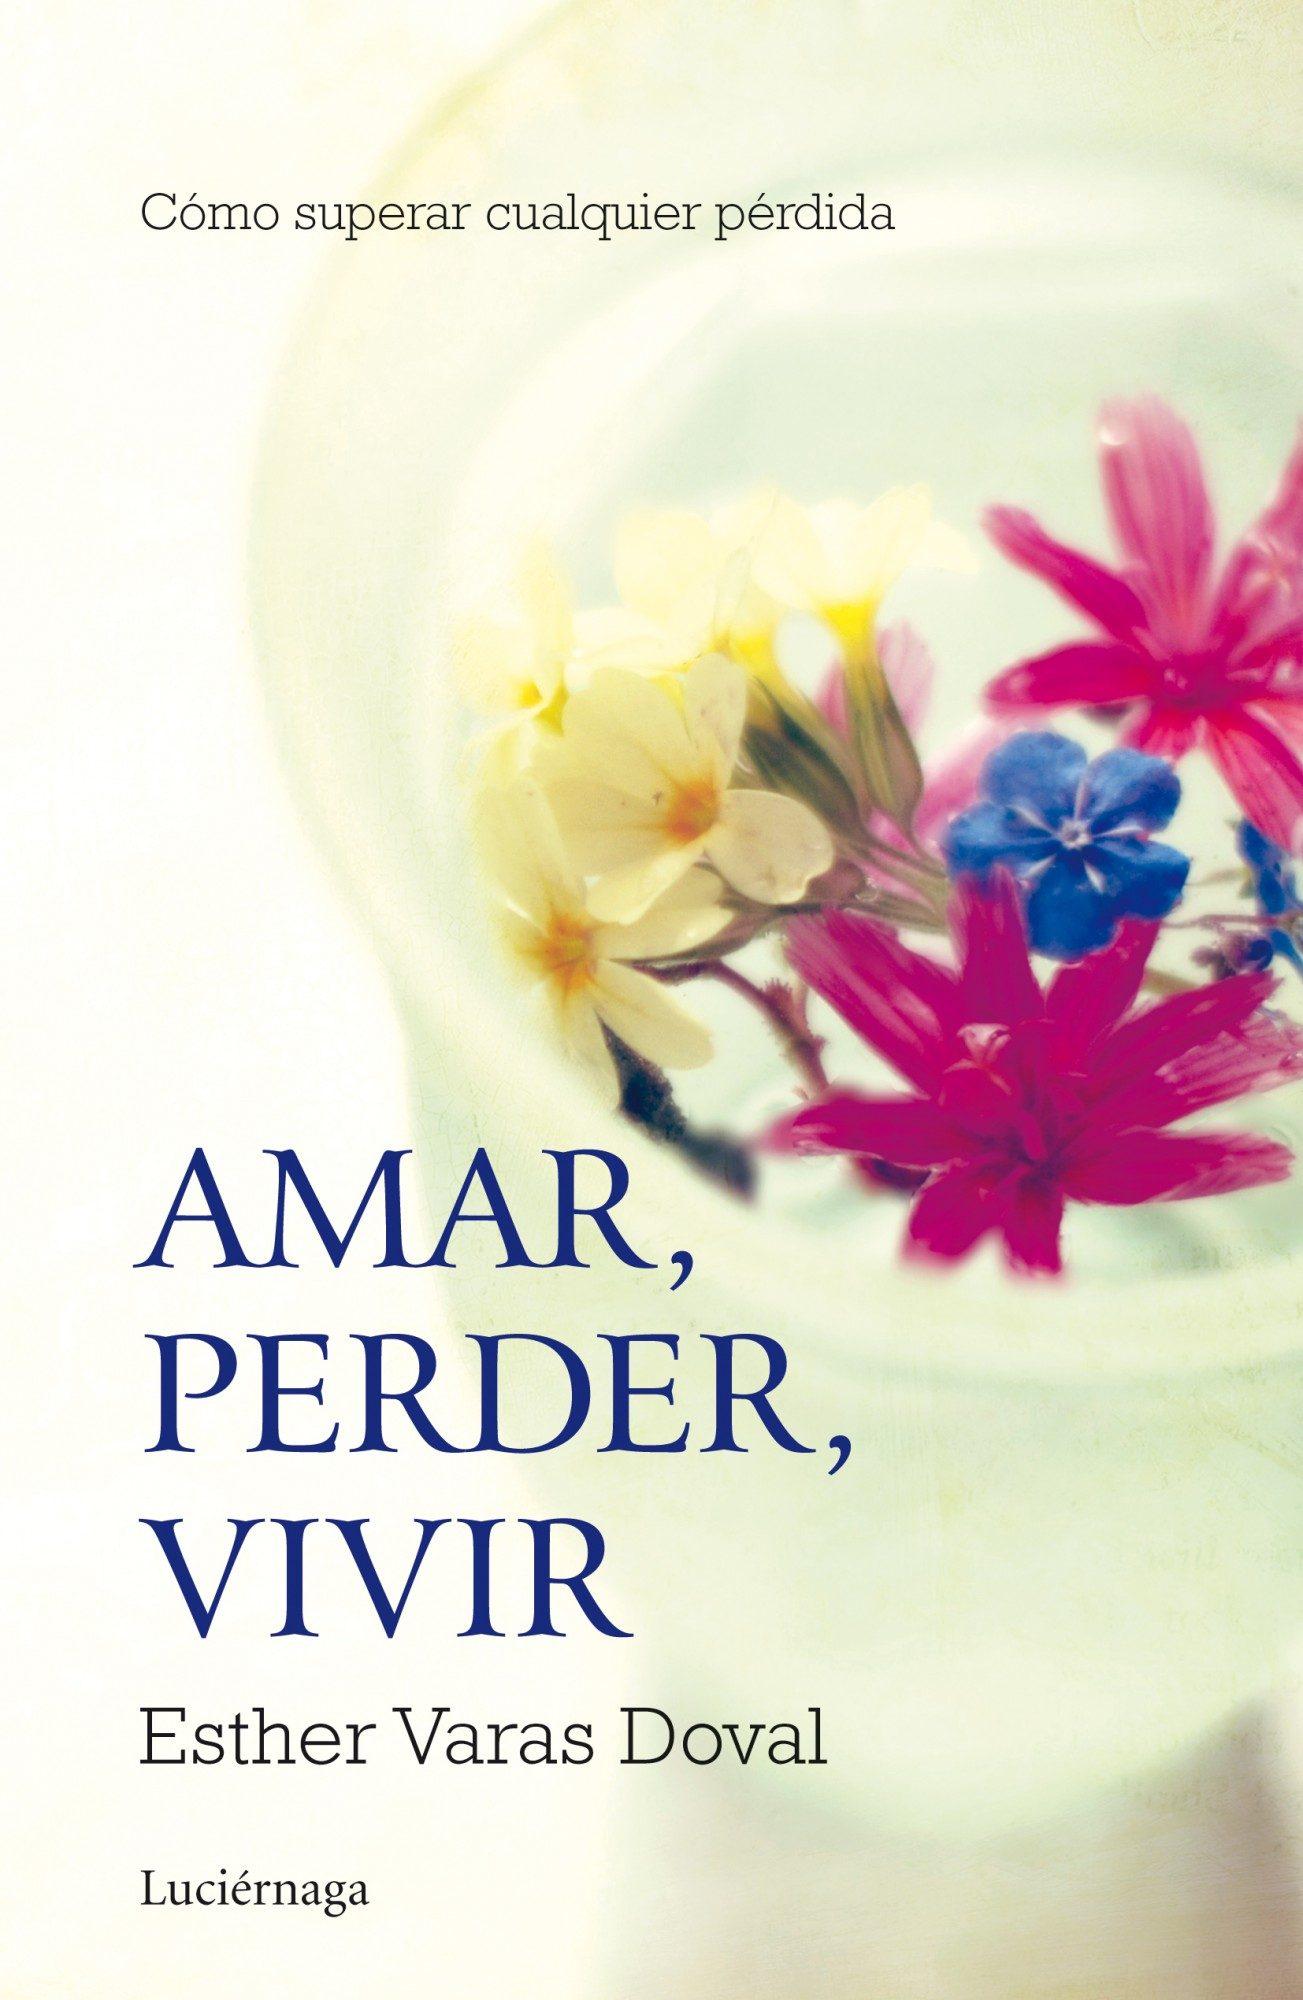 Amar, Perder, Vivir   por Esther Varas Doval epub